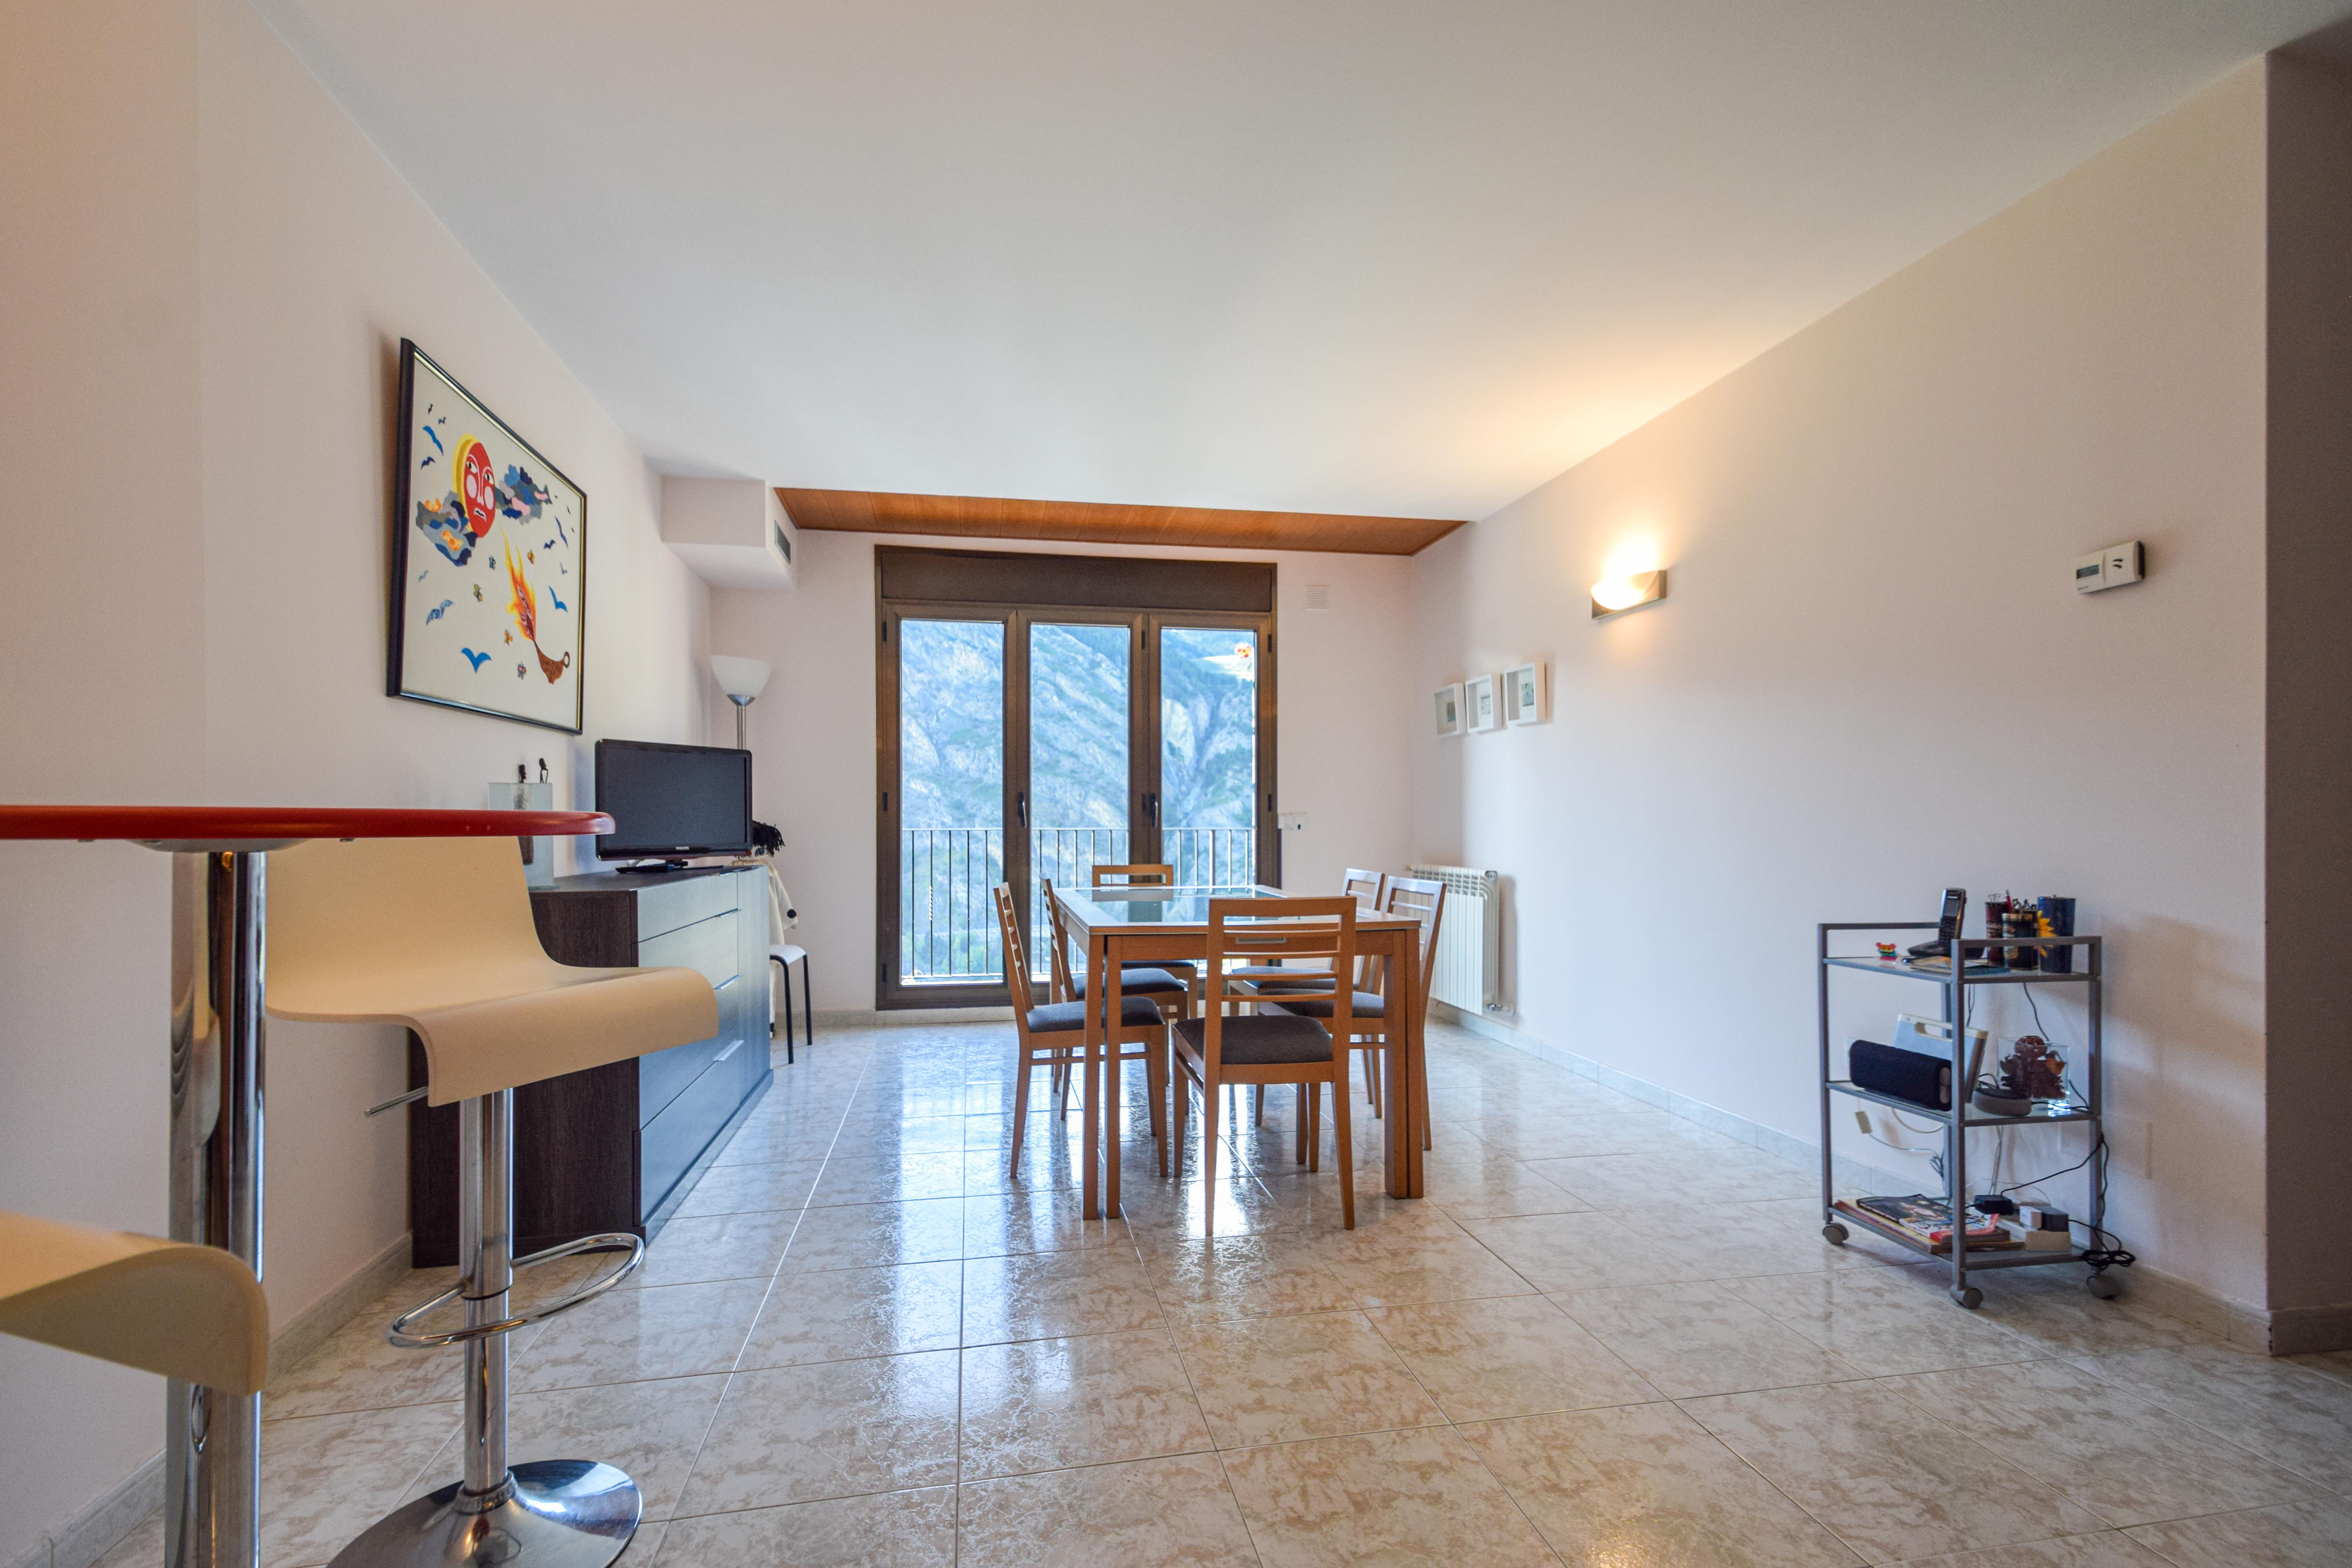 Dúplex en venda a Canillo, 4 habitacions, 165 metres